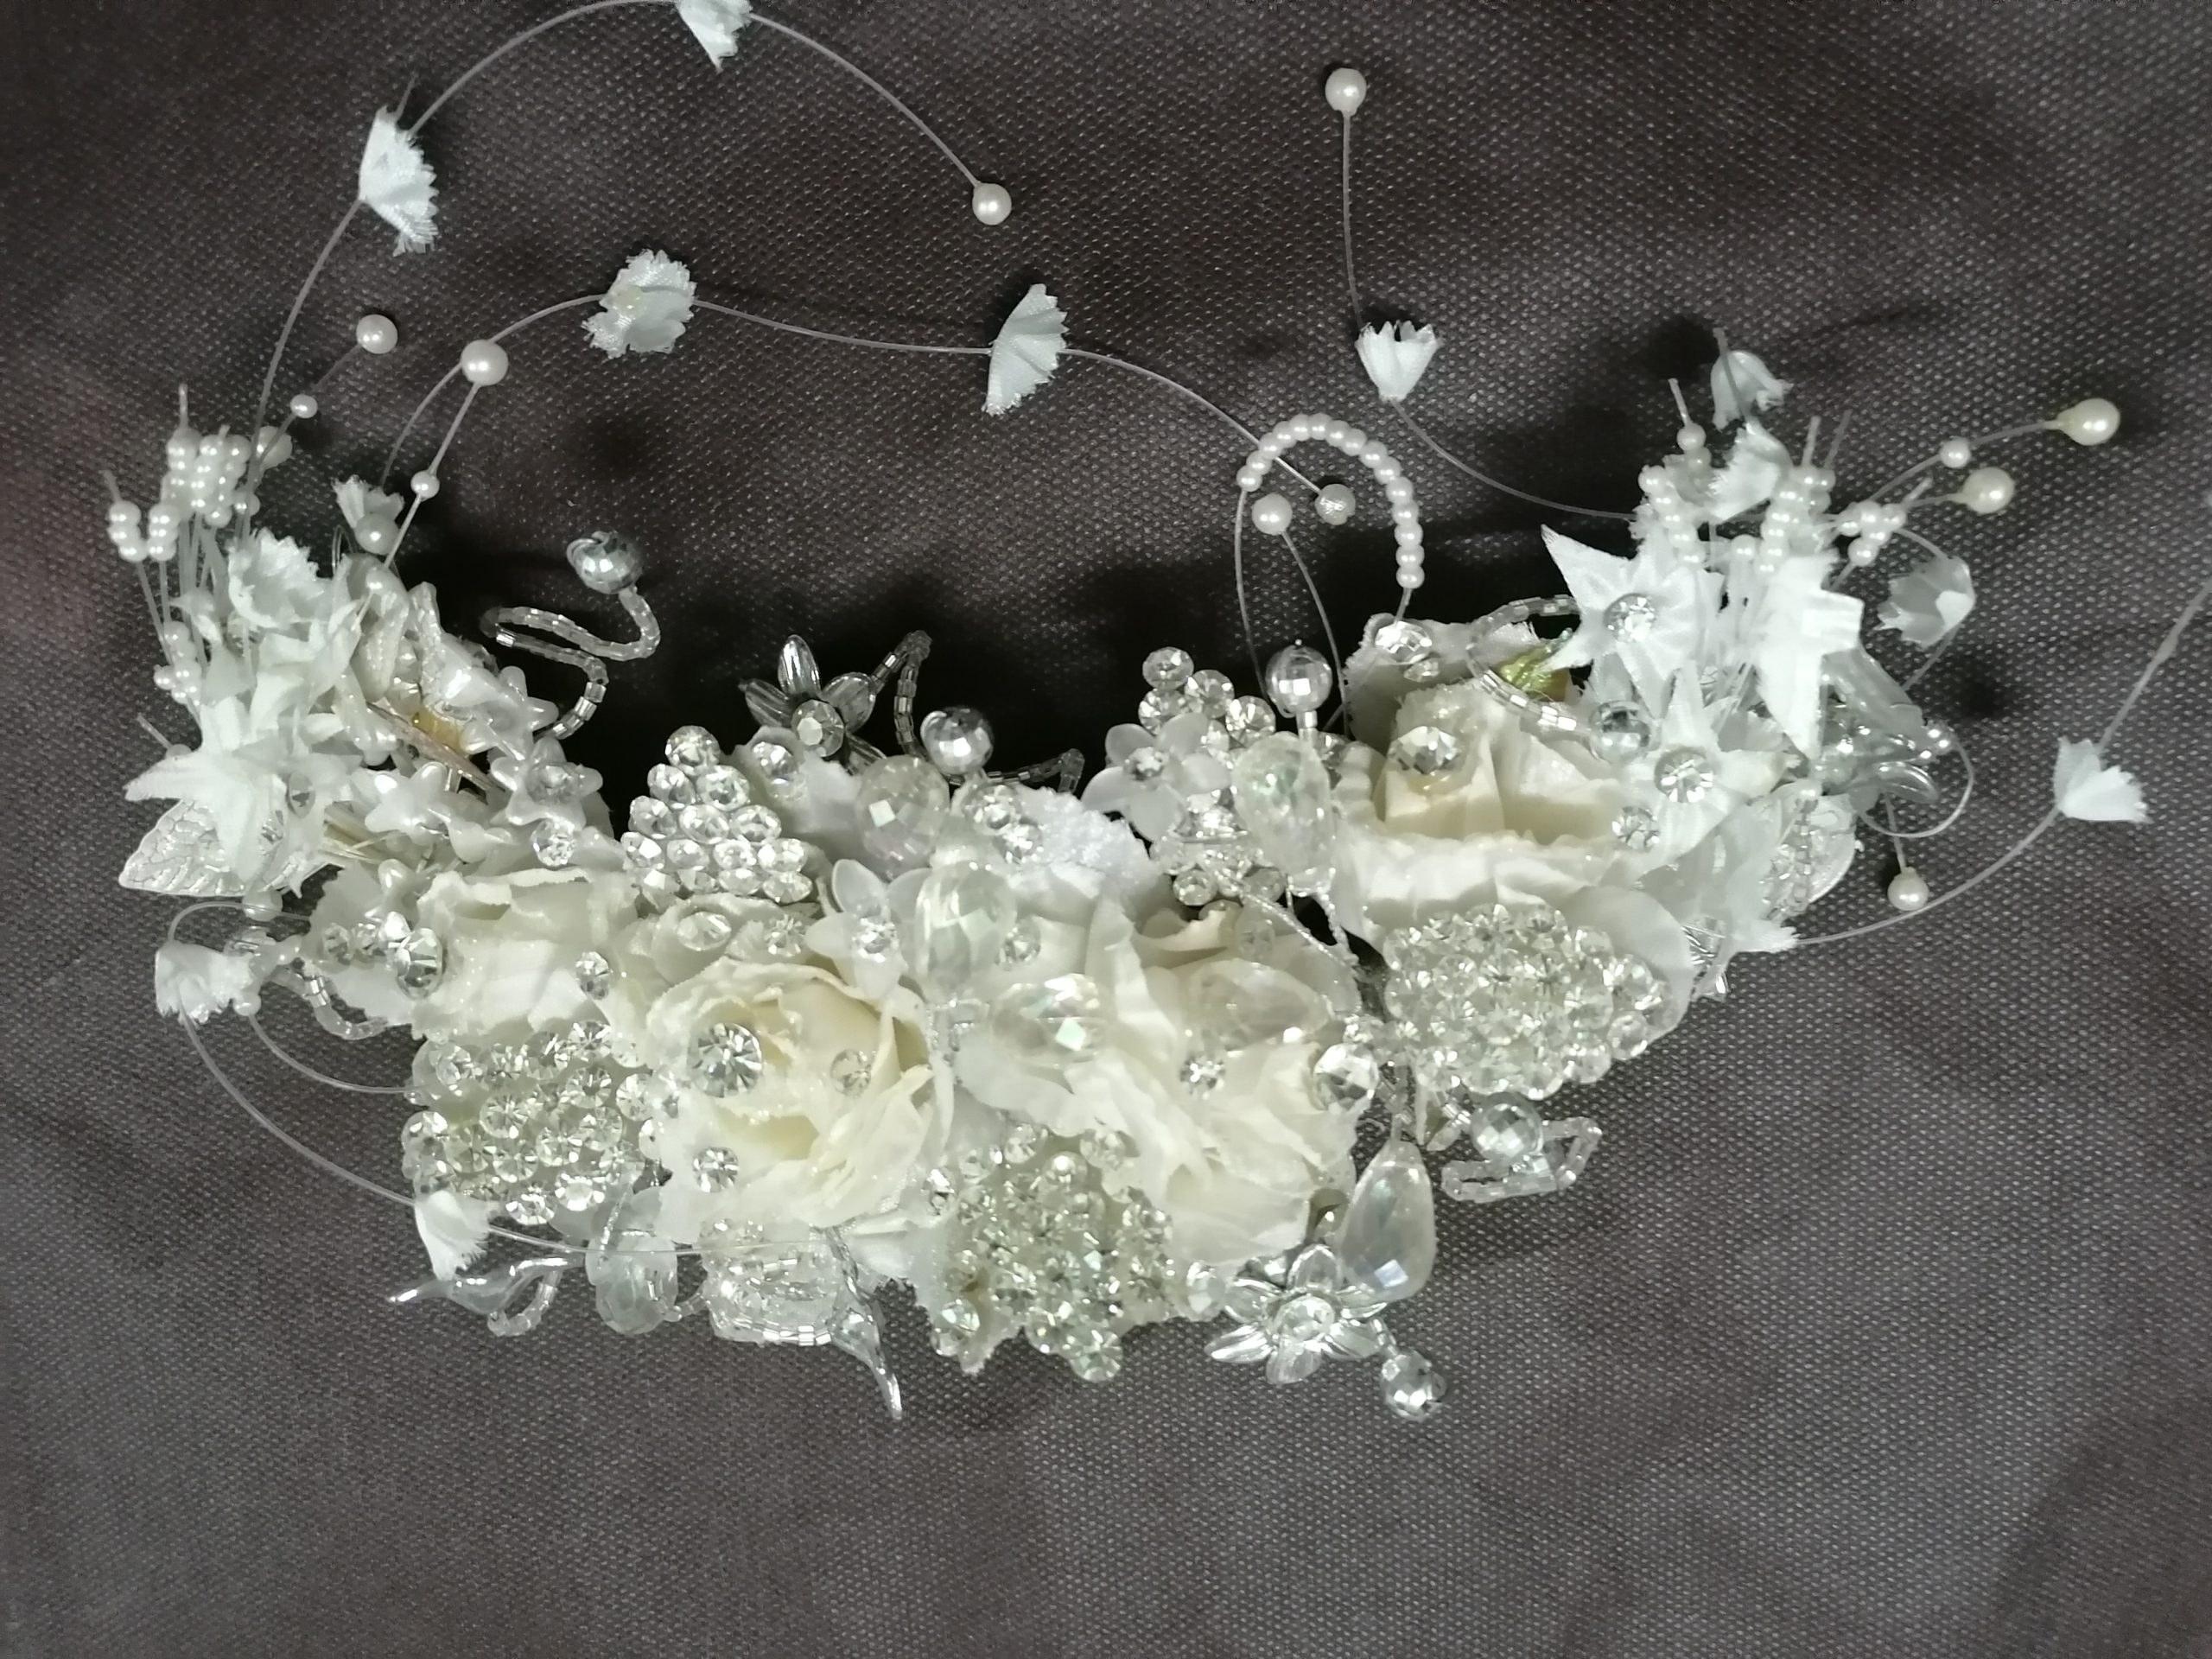 تصویر تاج عروس ، تاج سر، گل سر ( شیک و لاکچری ) باکیفیت